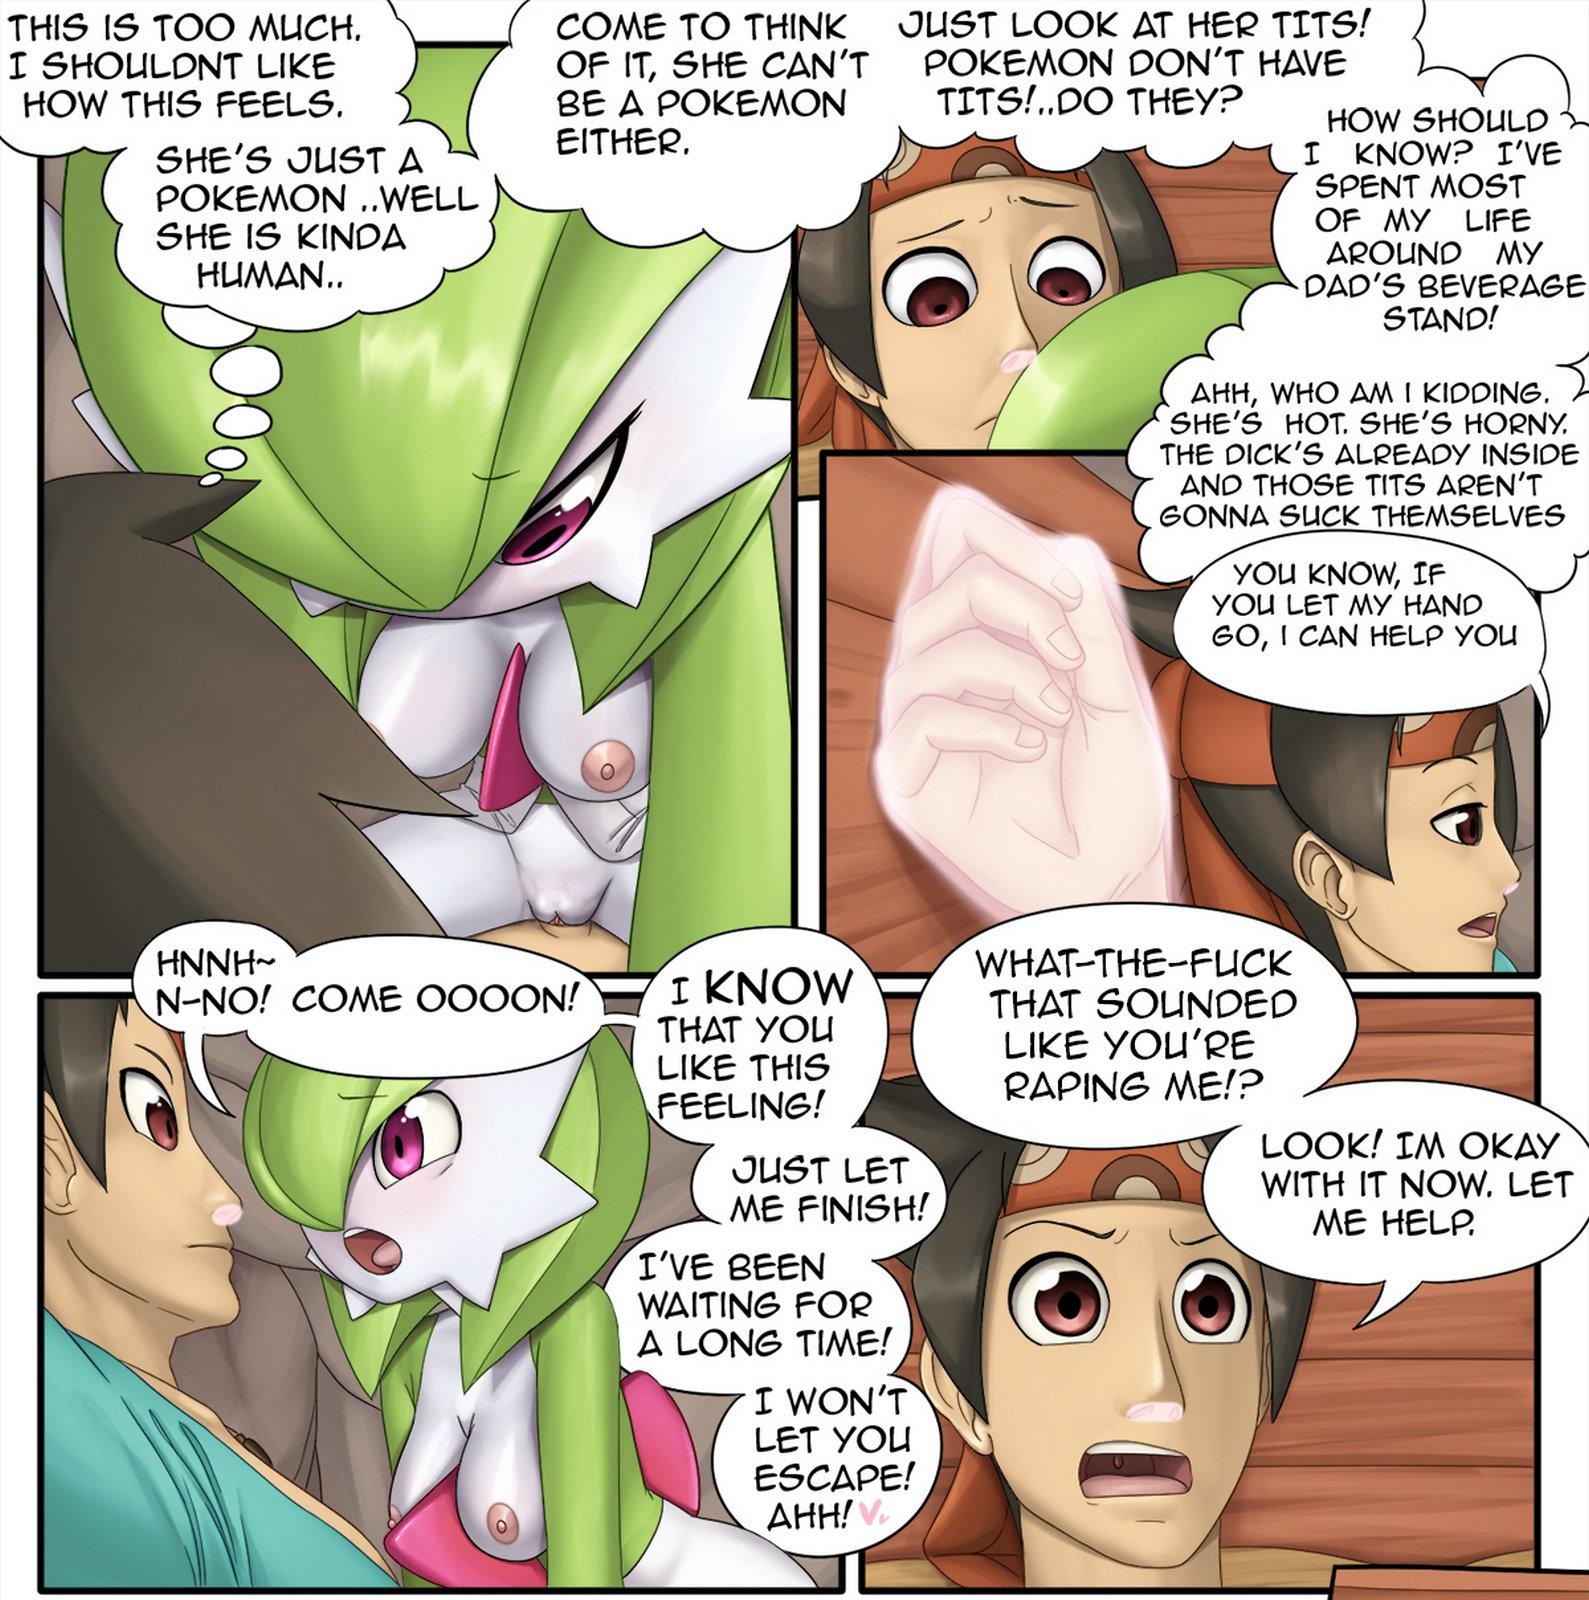 Deception (Pokemon) - part 2